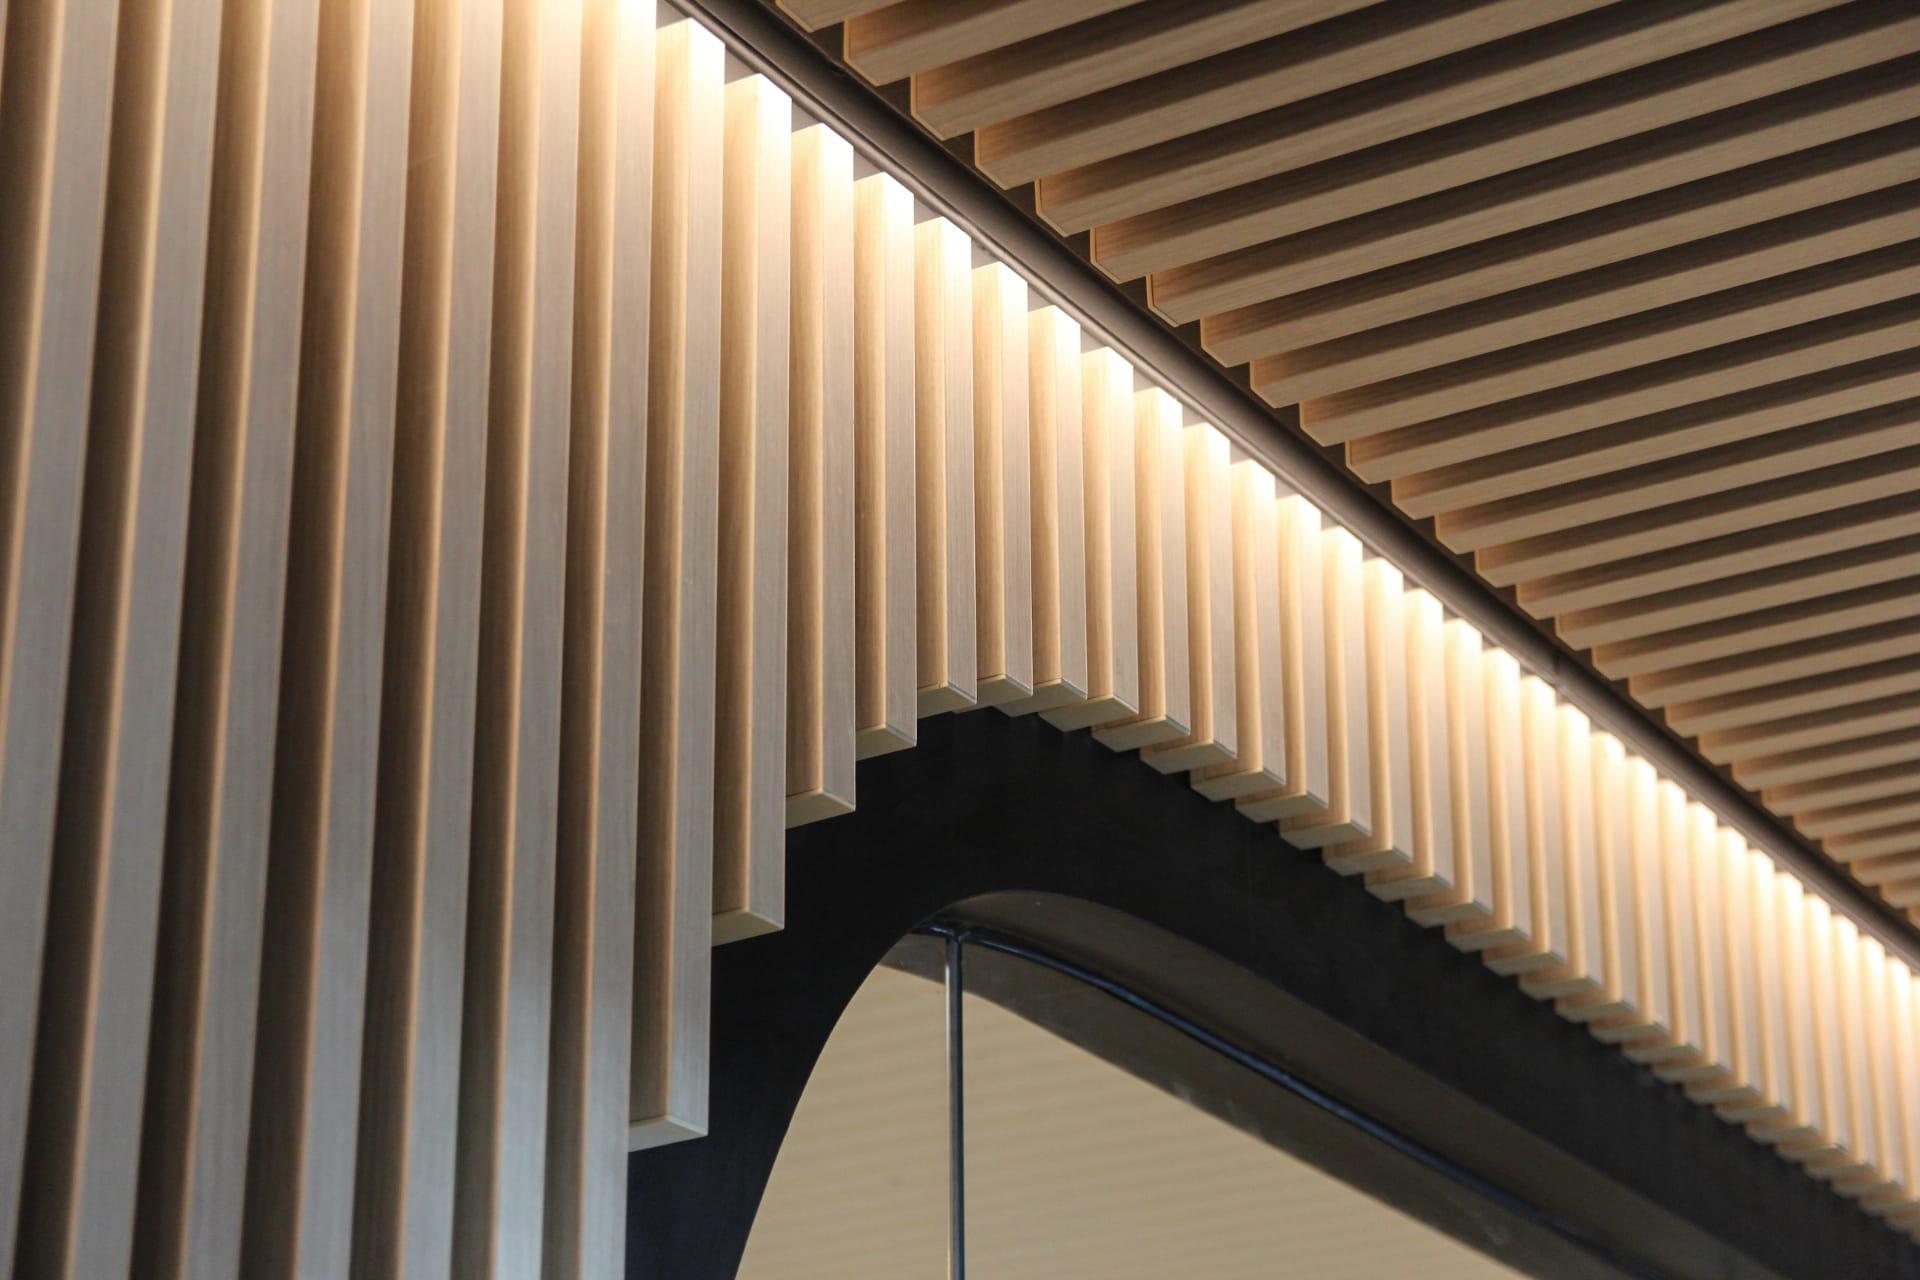 883 Collins St Multi-residential Pool Amenities - Melbourne VIC Ever Art Wood® battens - Kabebari 30x50 in Supuringu Oku